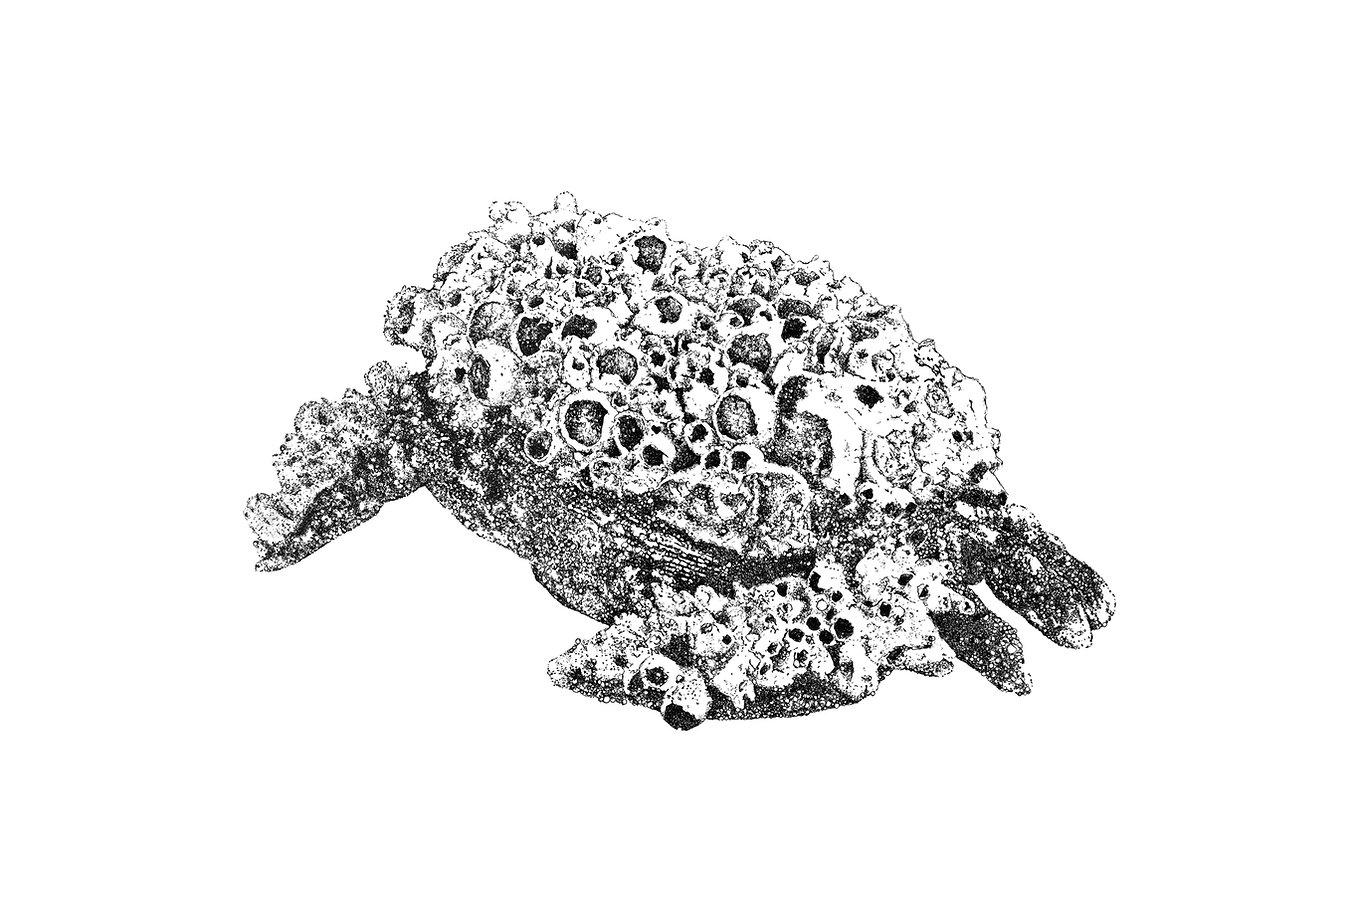 drawing fosca artist roberto cuoghi Granchio Crab ink